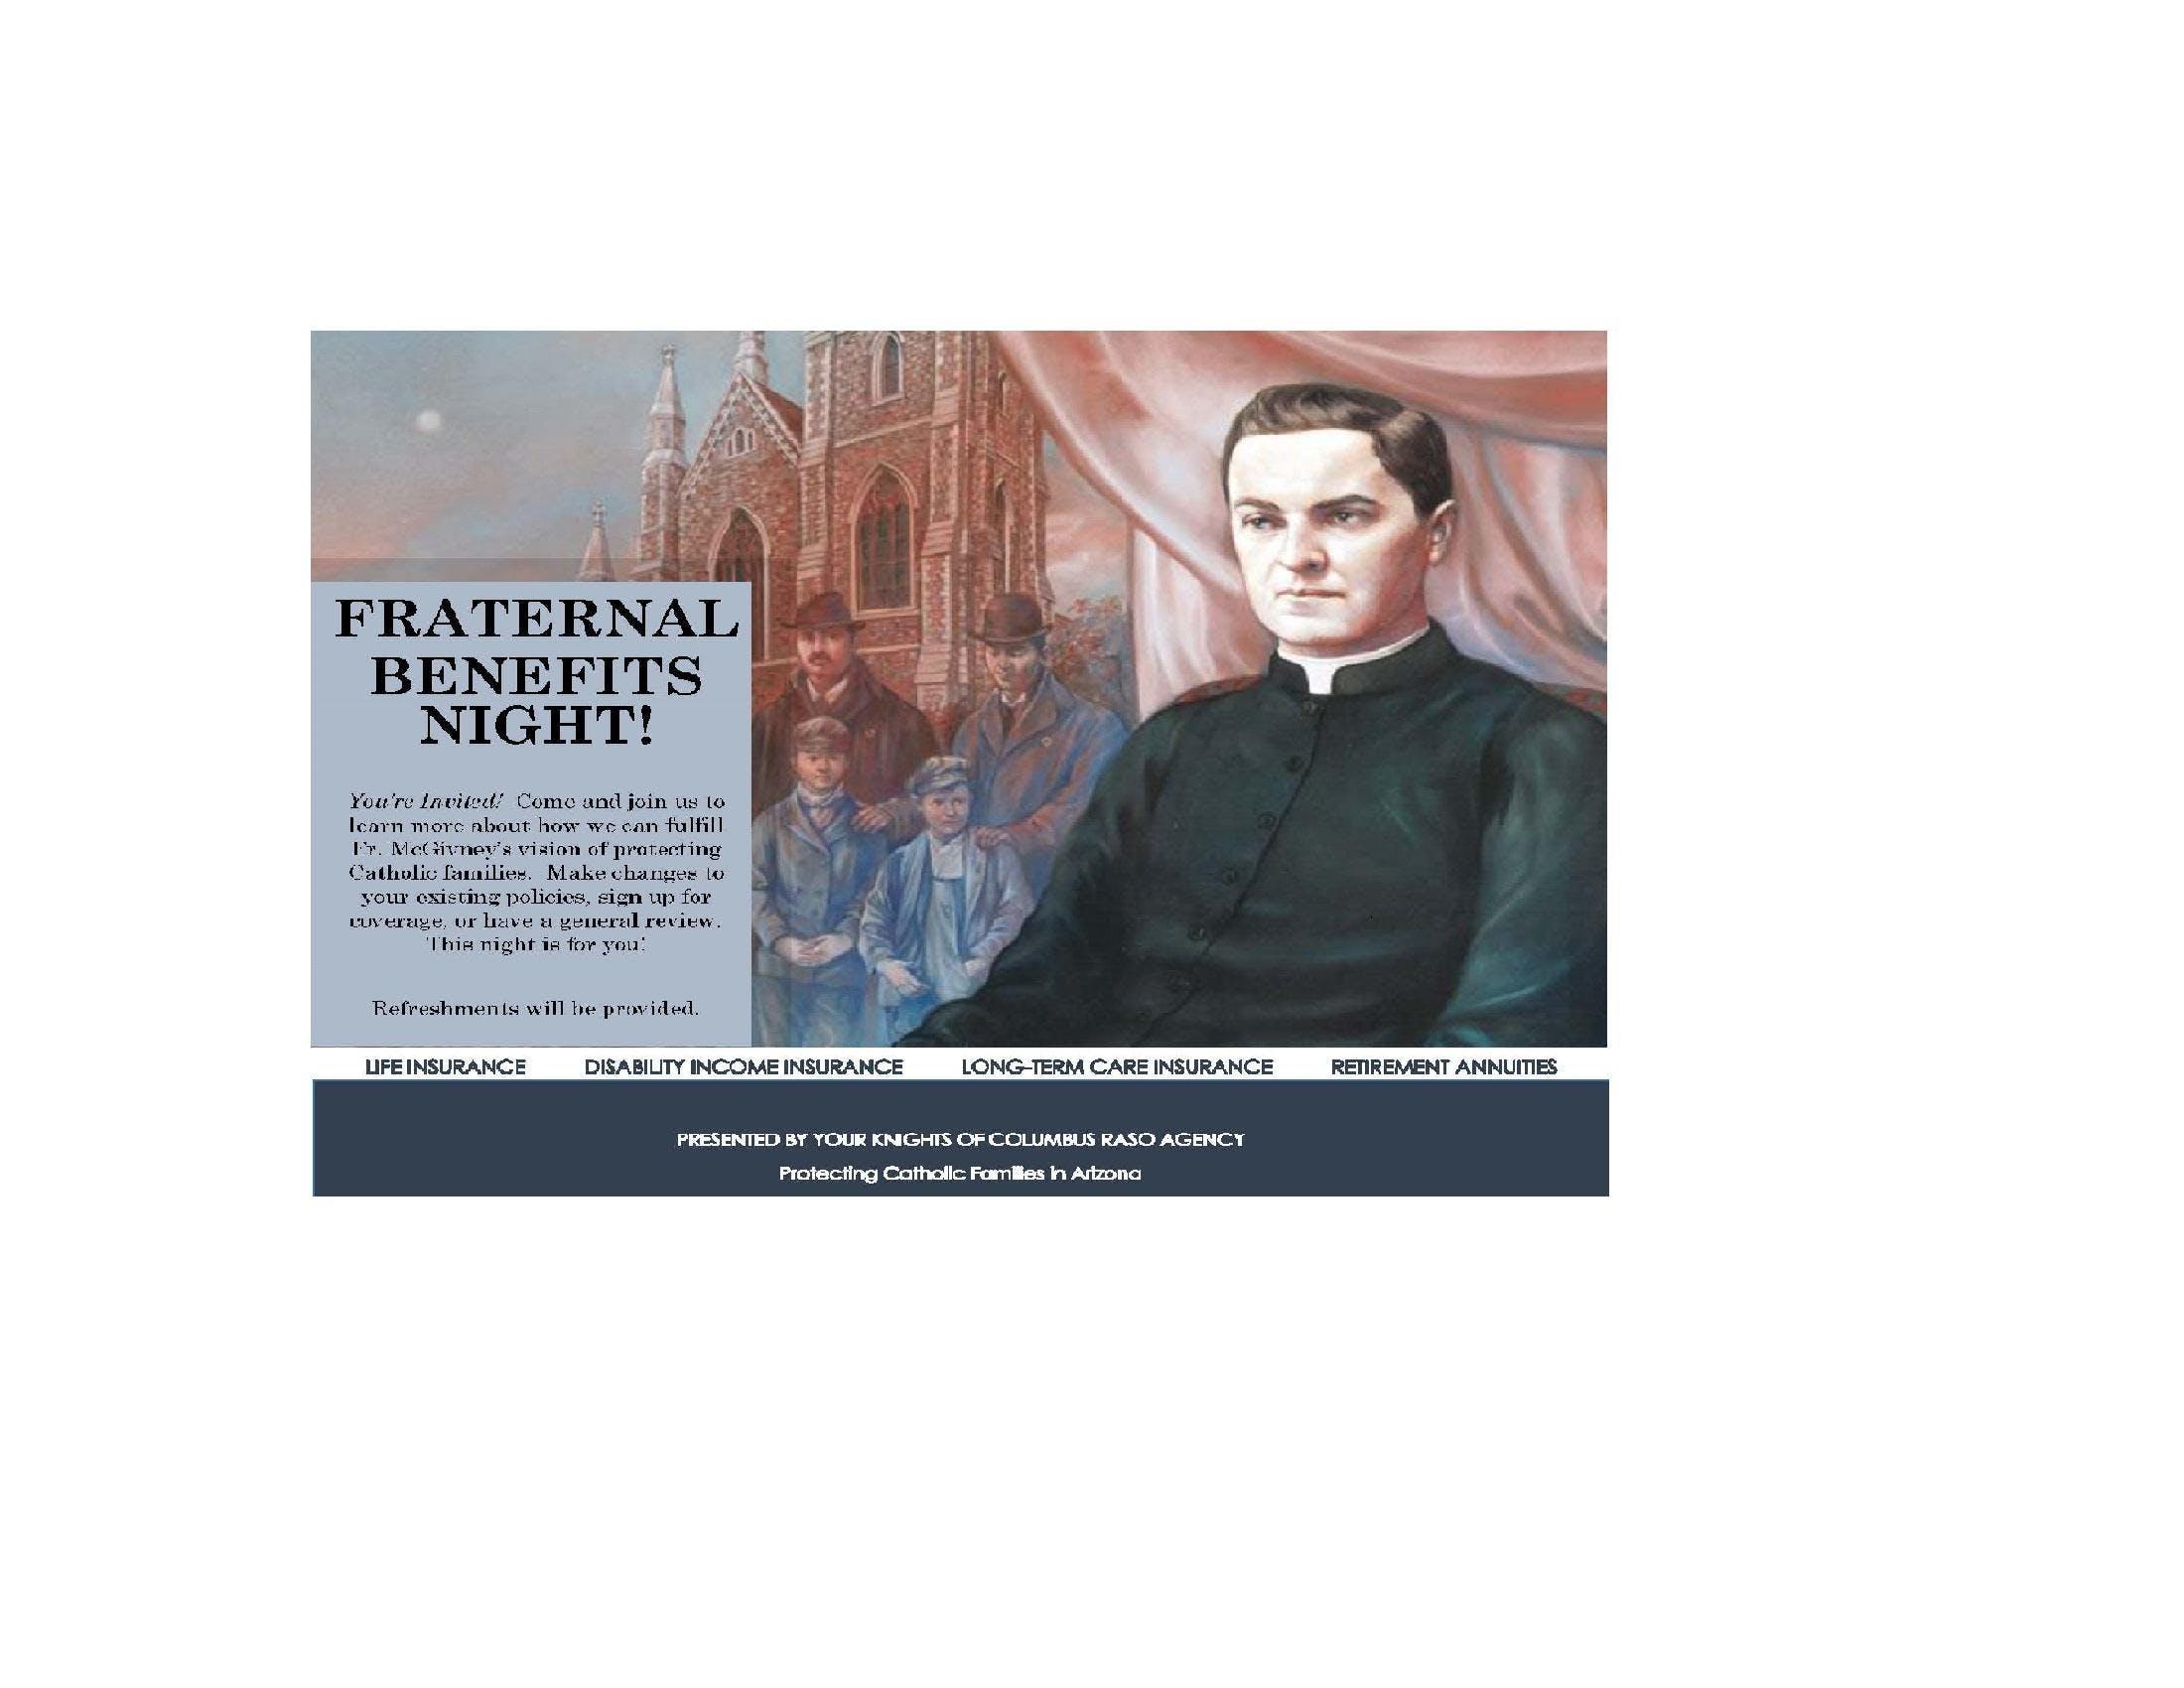 Fraternal Benefits Night